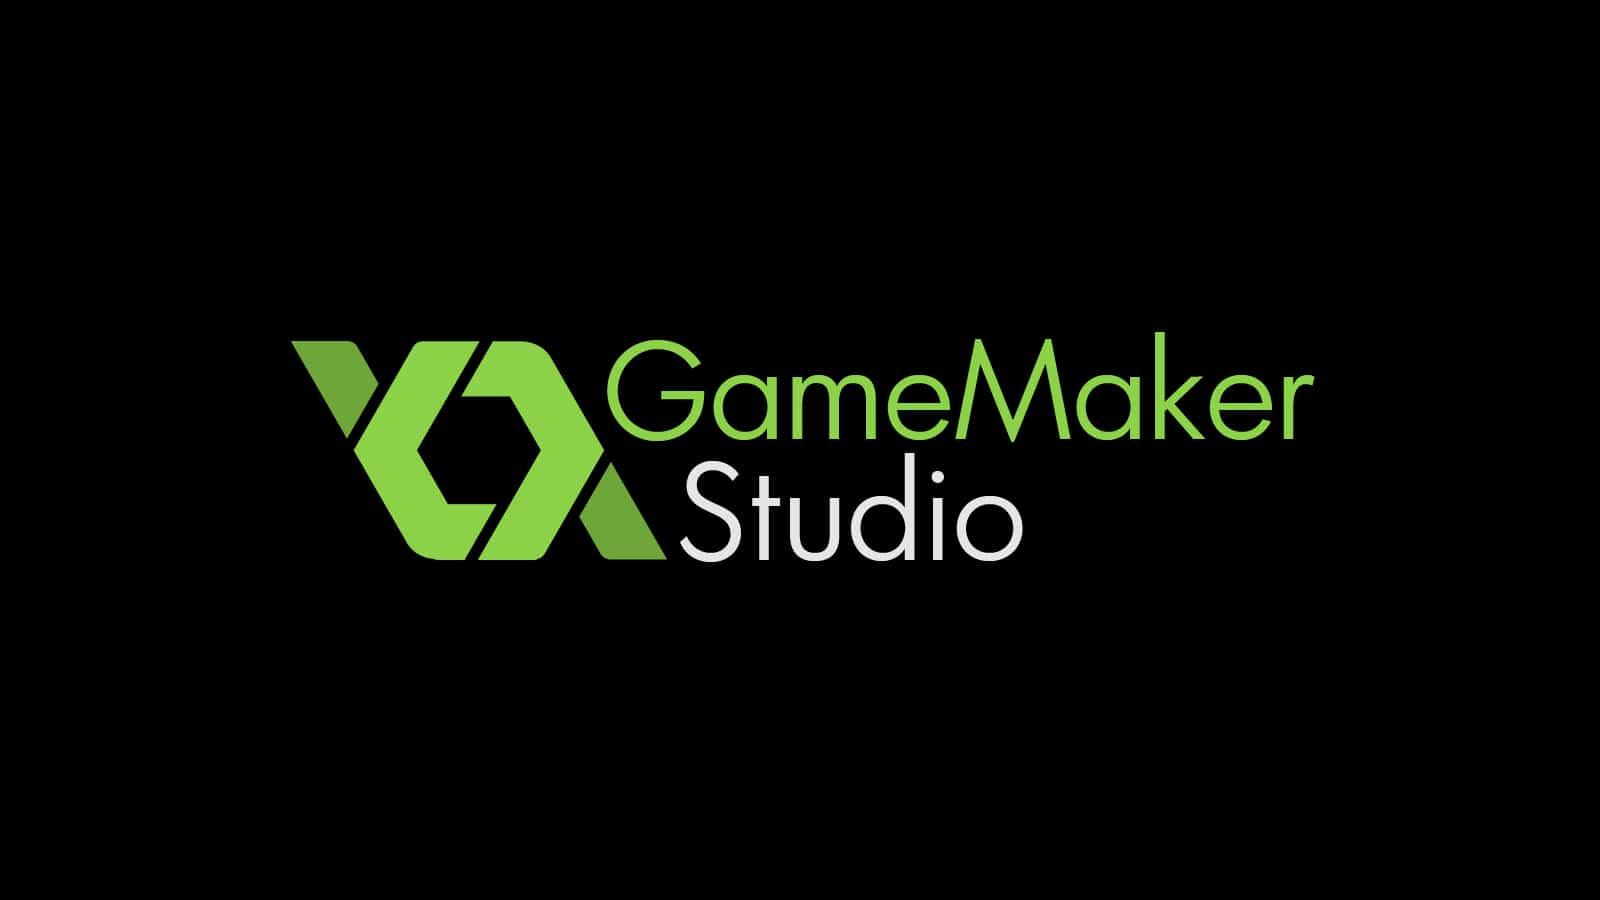 Introduction to GameMaker Studio 2